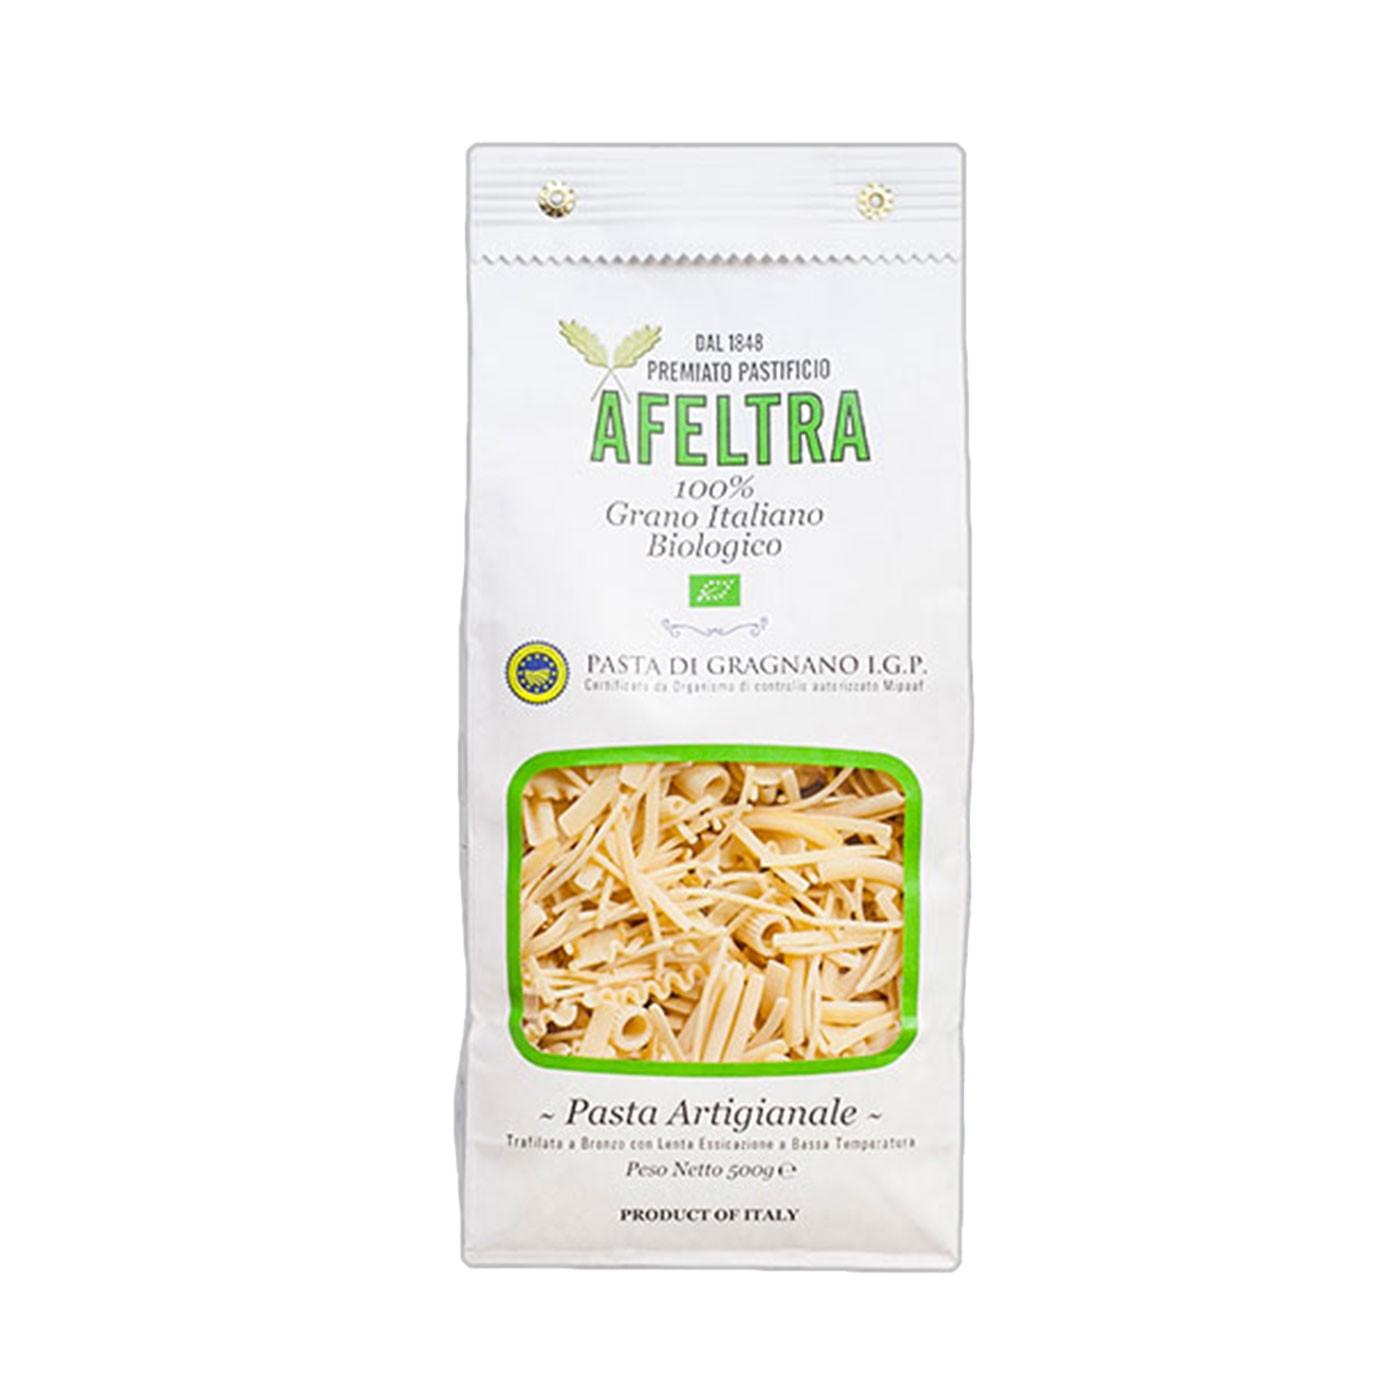 Organic Pasta Mista 17.6 oz - Afeltra